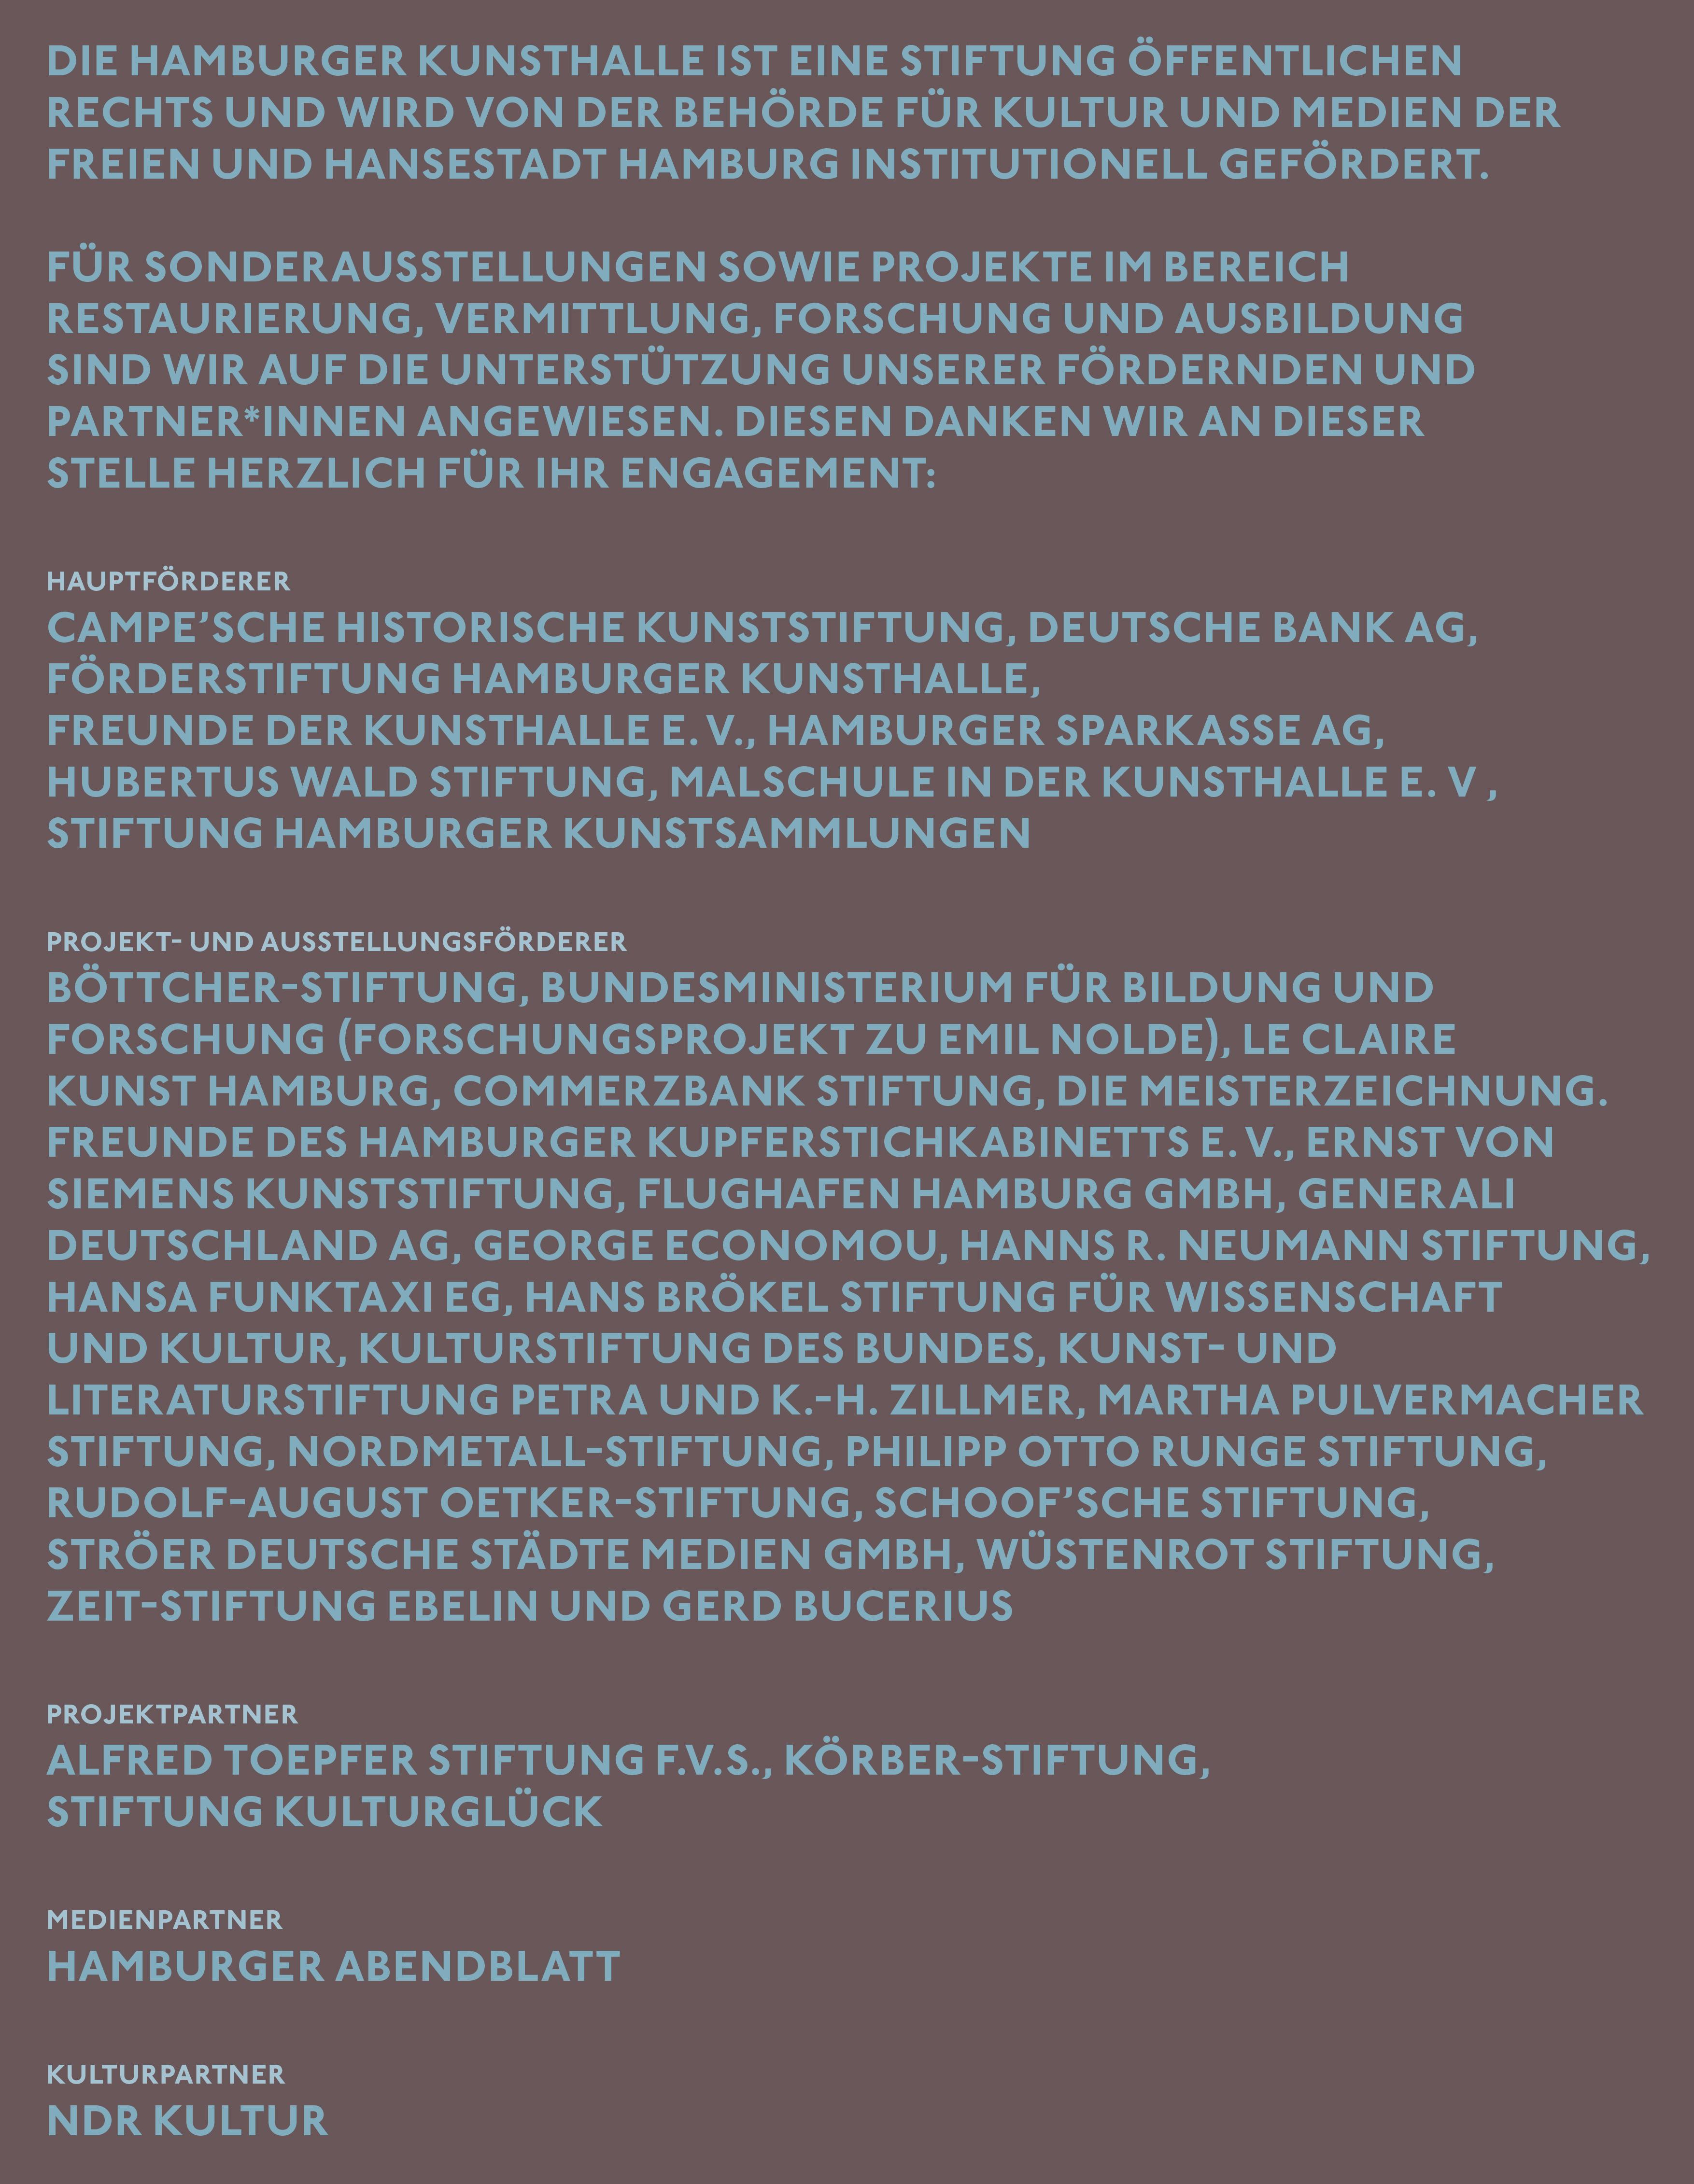 Förderer Hamburger Kunsthalle